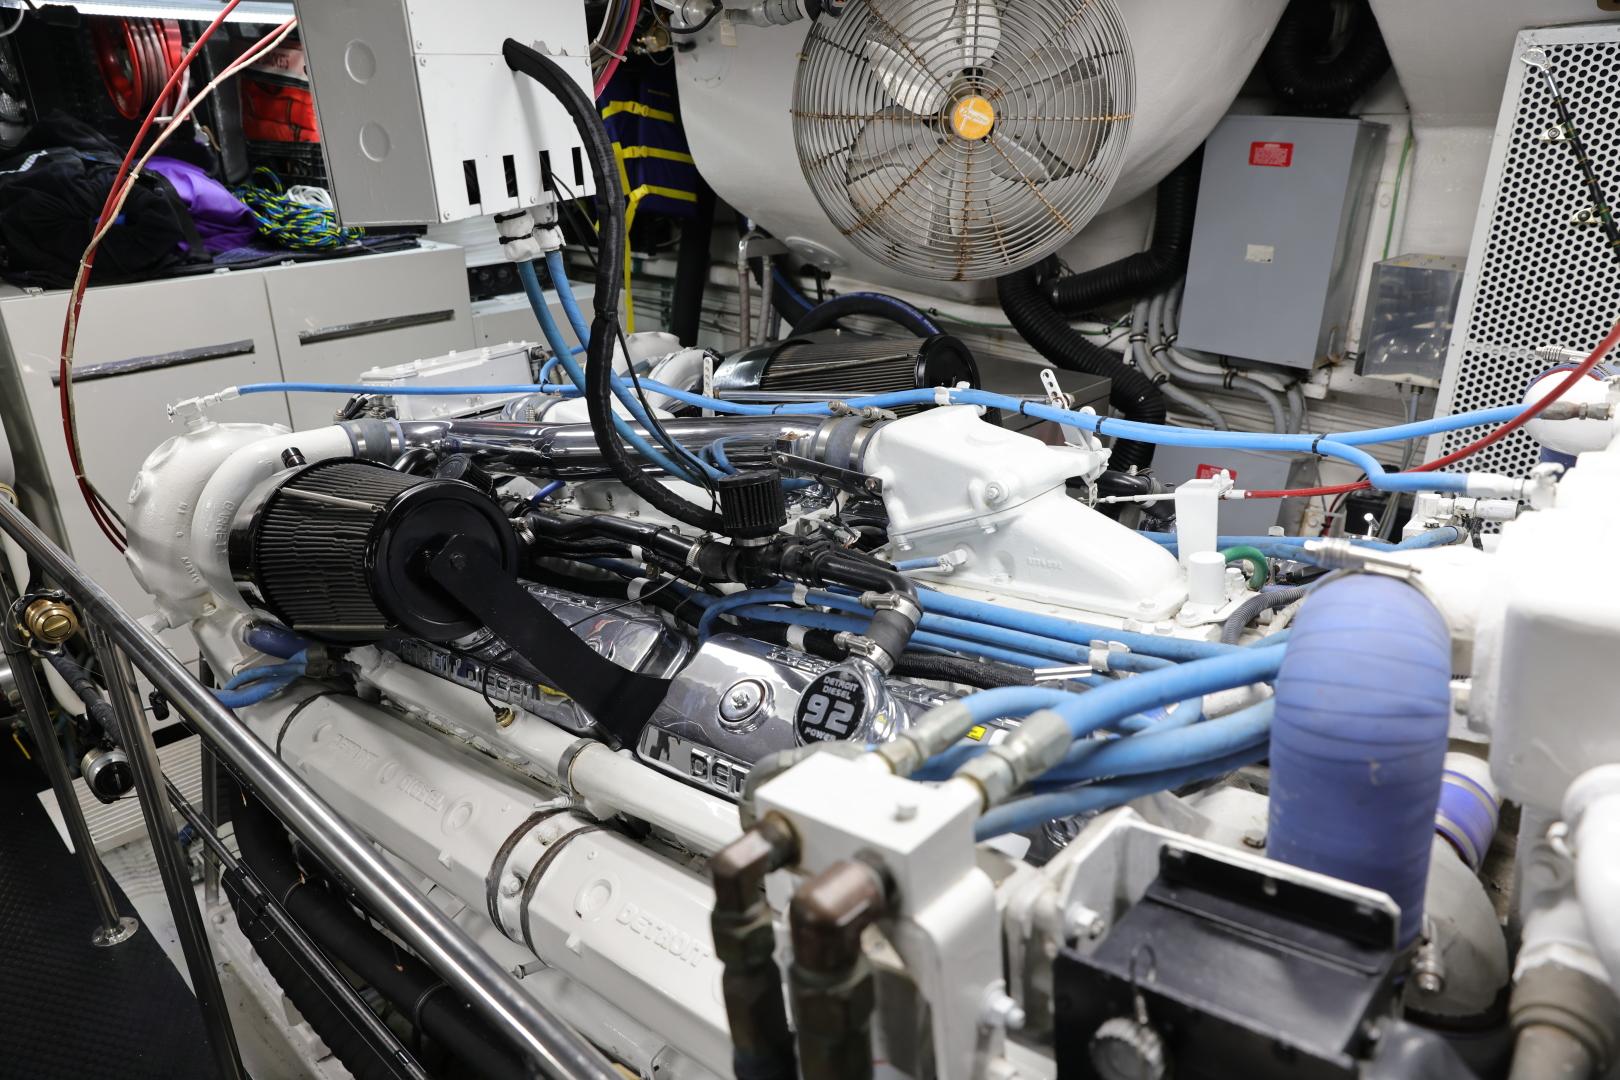 Hatteras-Convertible 1995-LADY LILA Newport Beach-California-United States-ENGINE ROOM-1516279 | Thumbnail